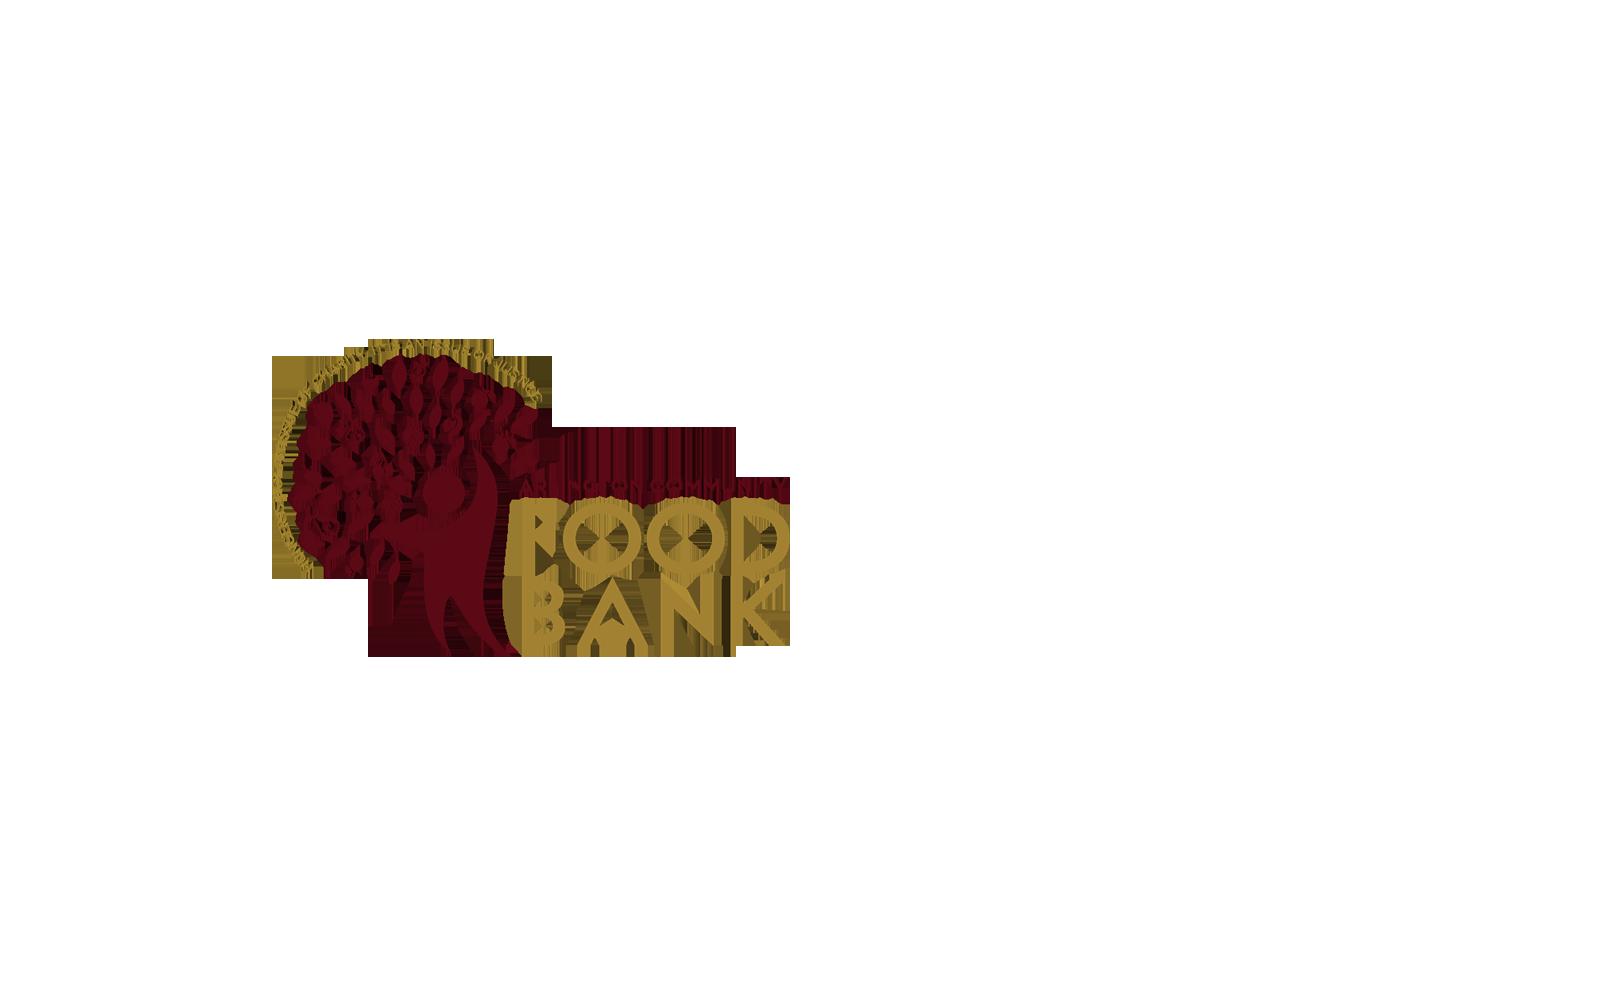 Donate to the Arlington Community Food Bank image